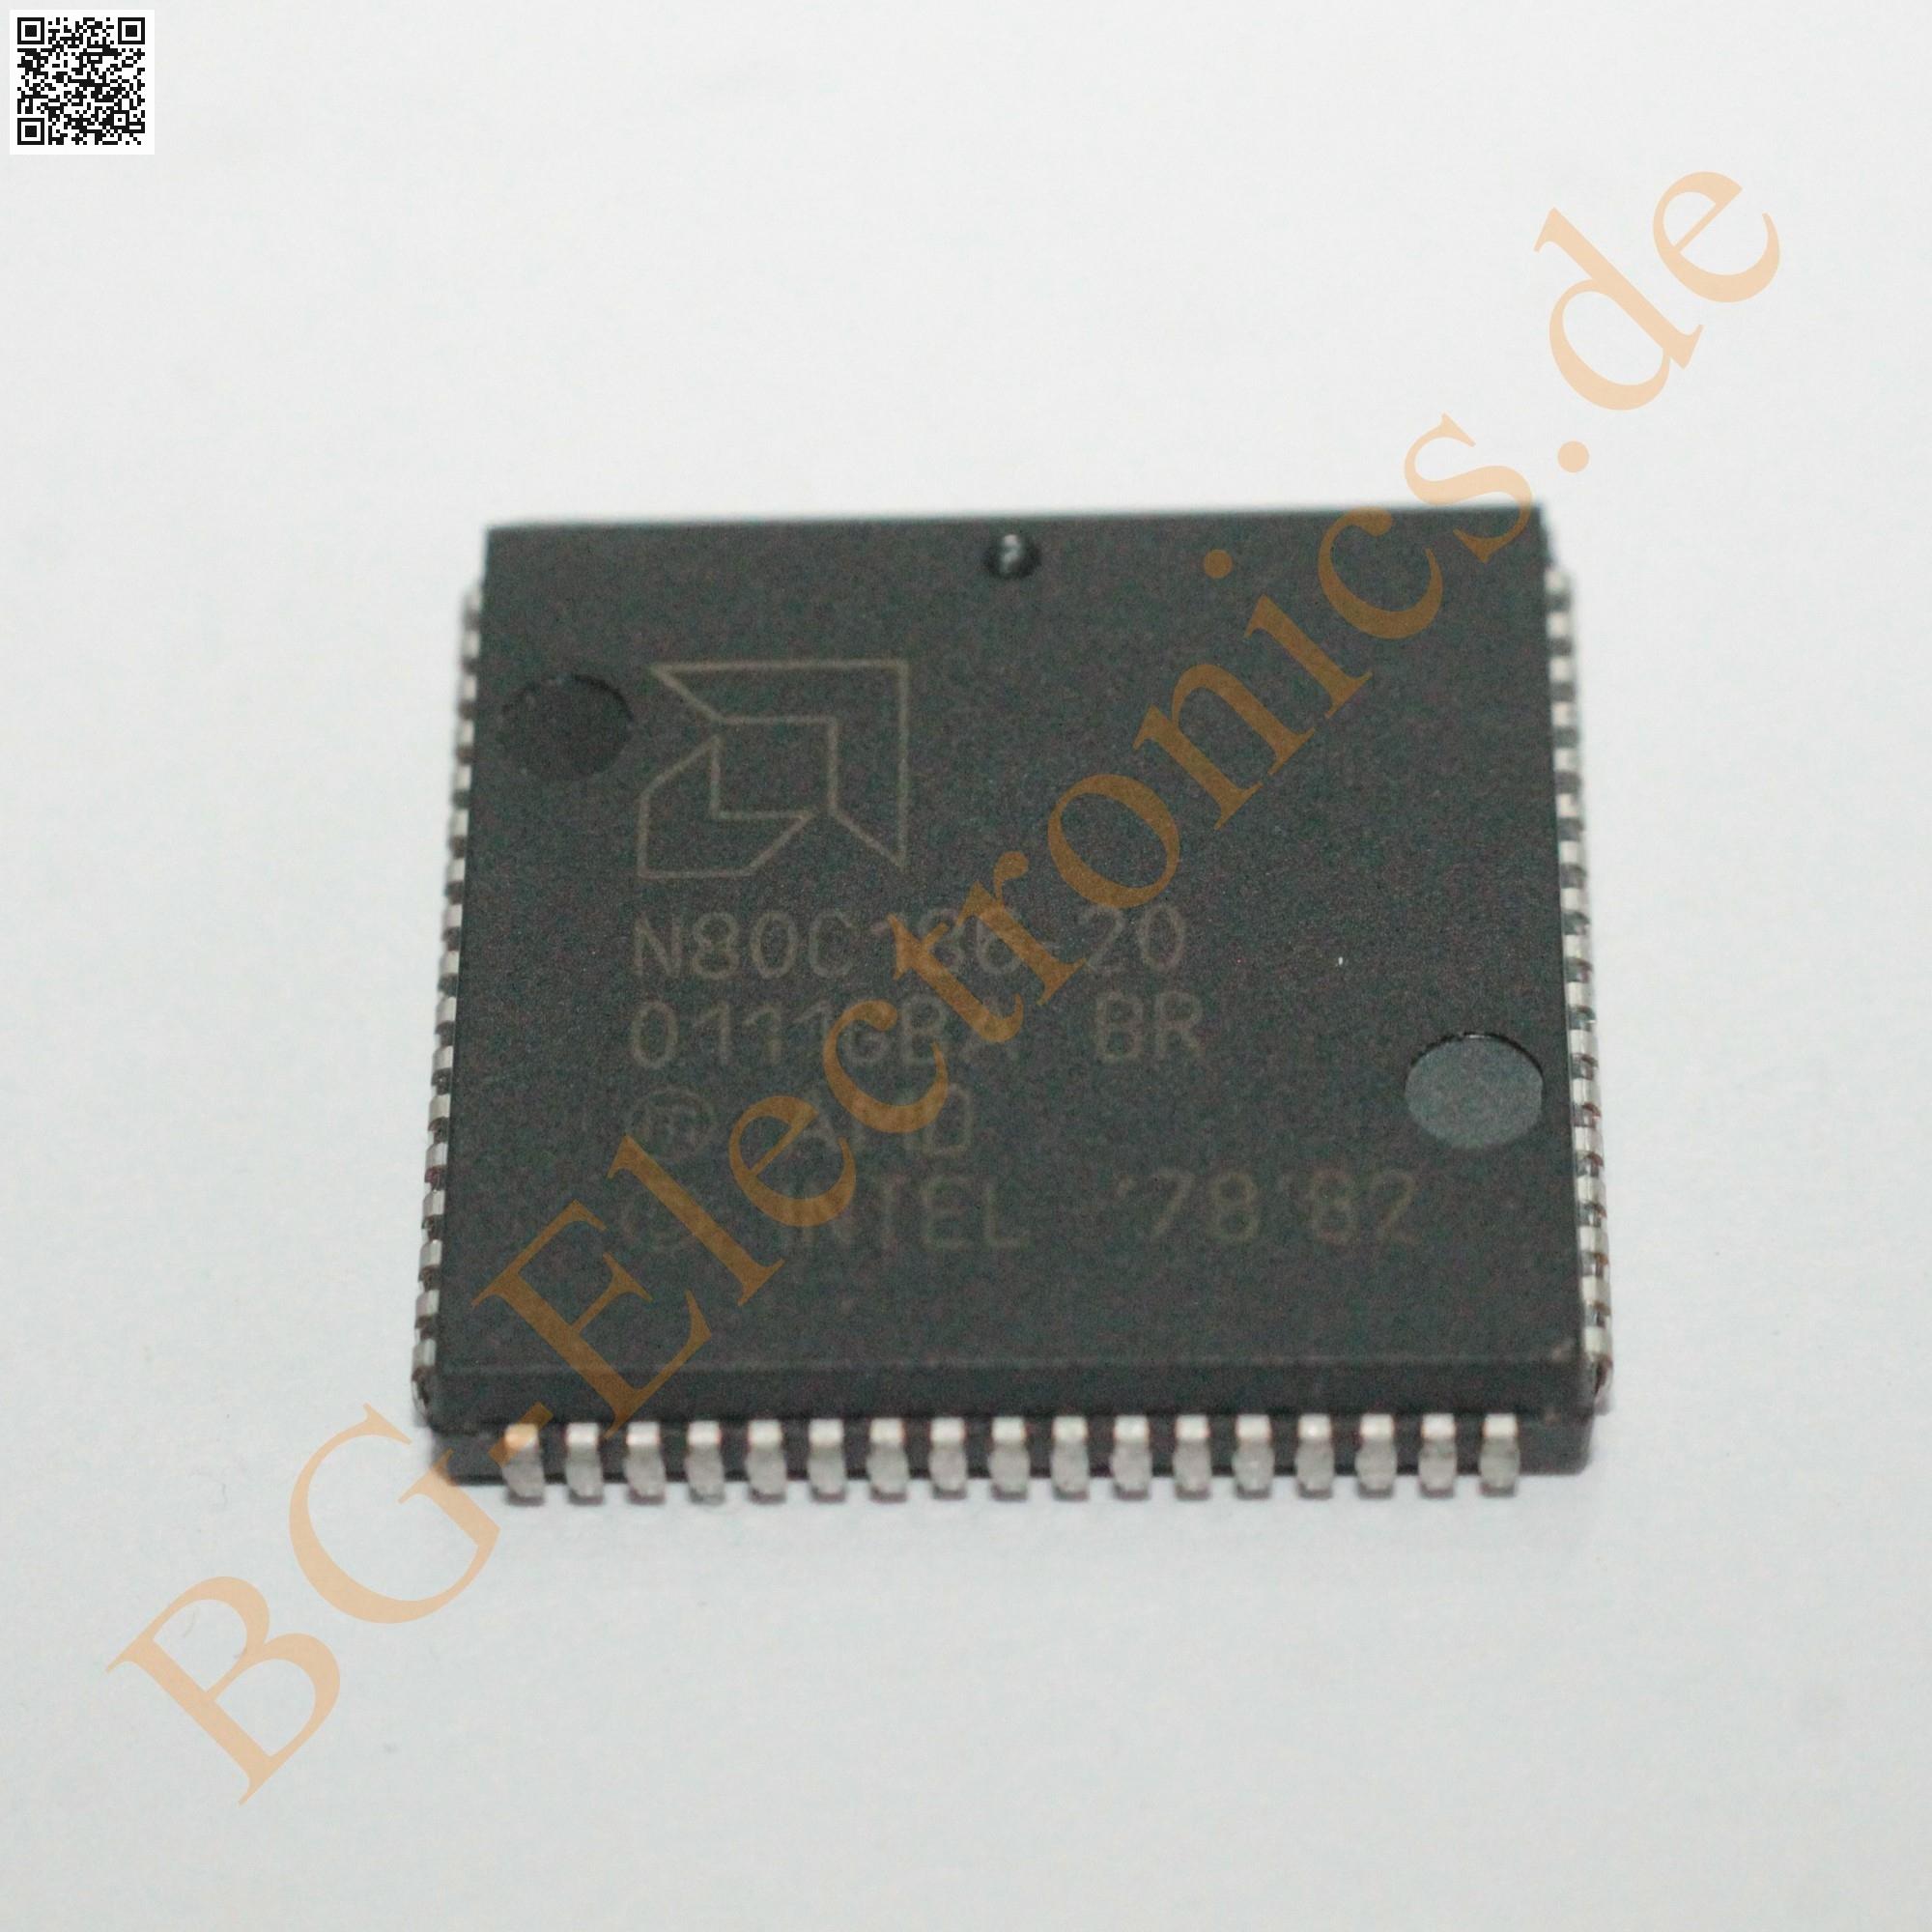 Intel EE80C196NT EN80C196NT 80C196 16BIT MPU MCU 5V 20MHz PLCC68 x 1pc